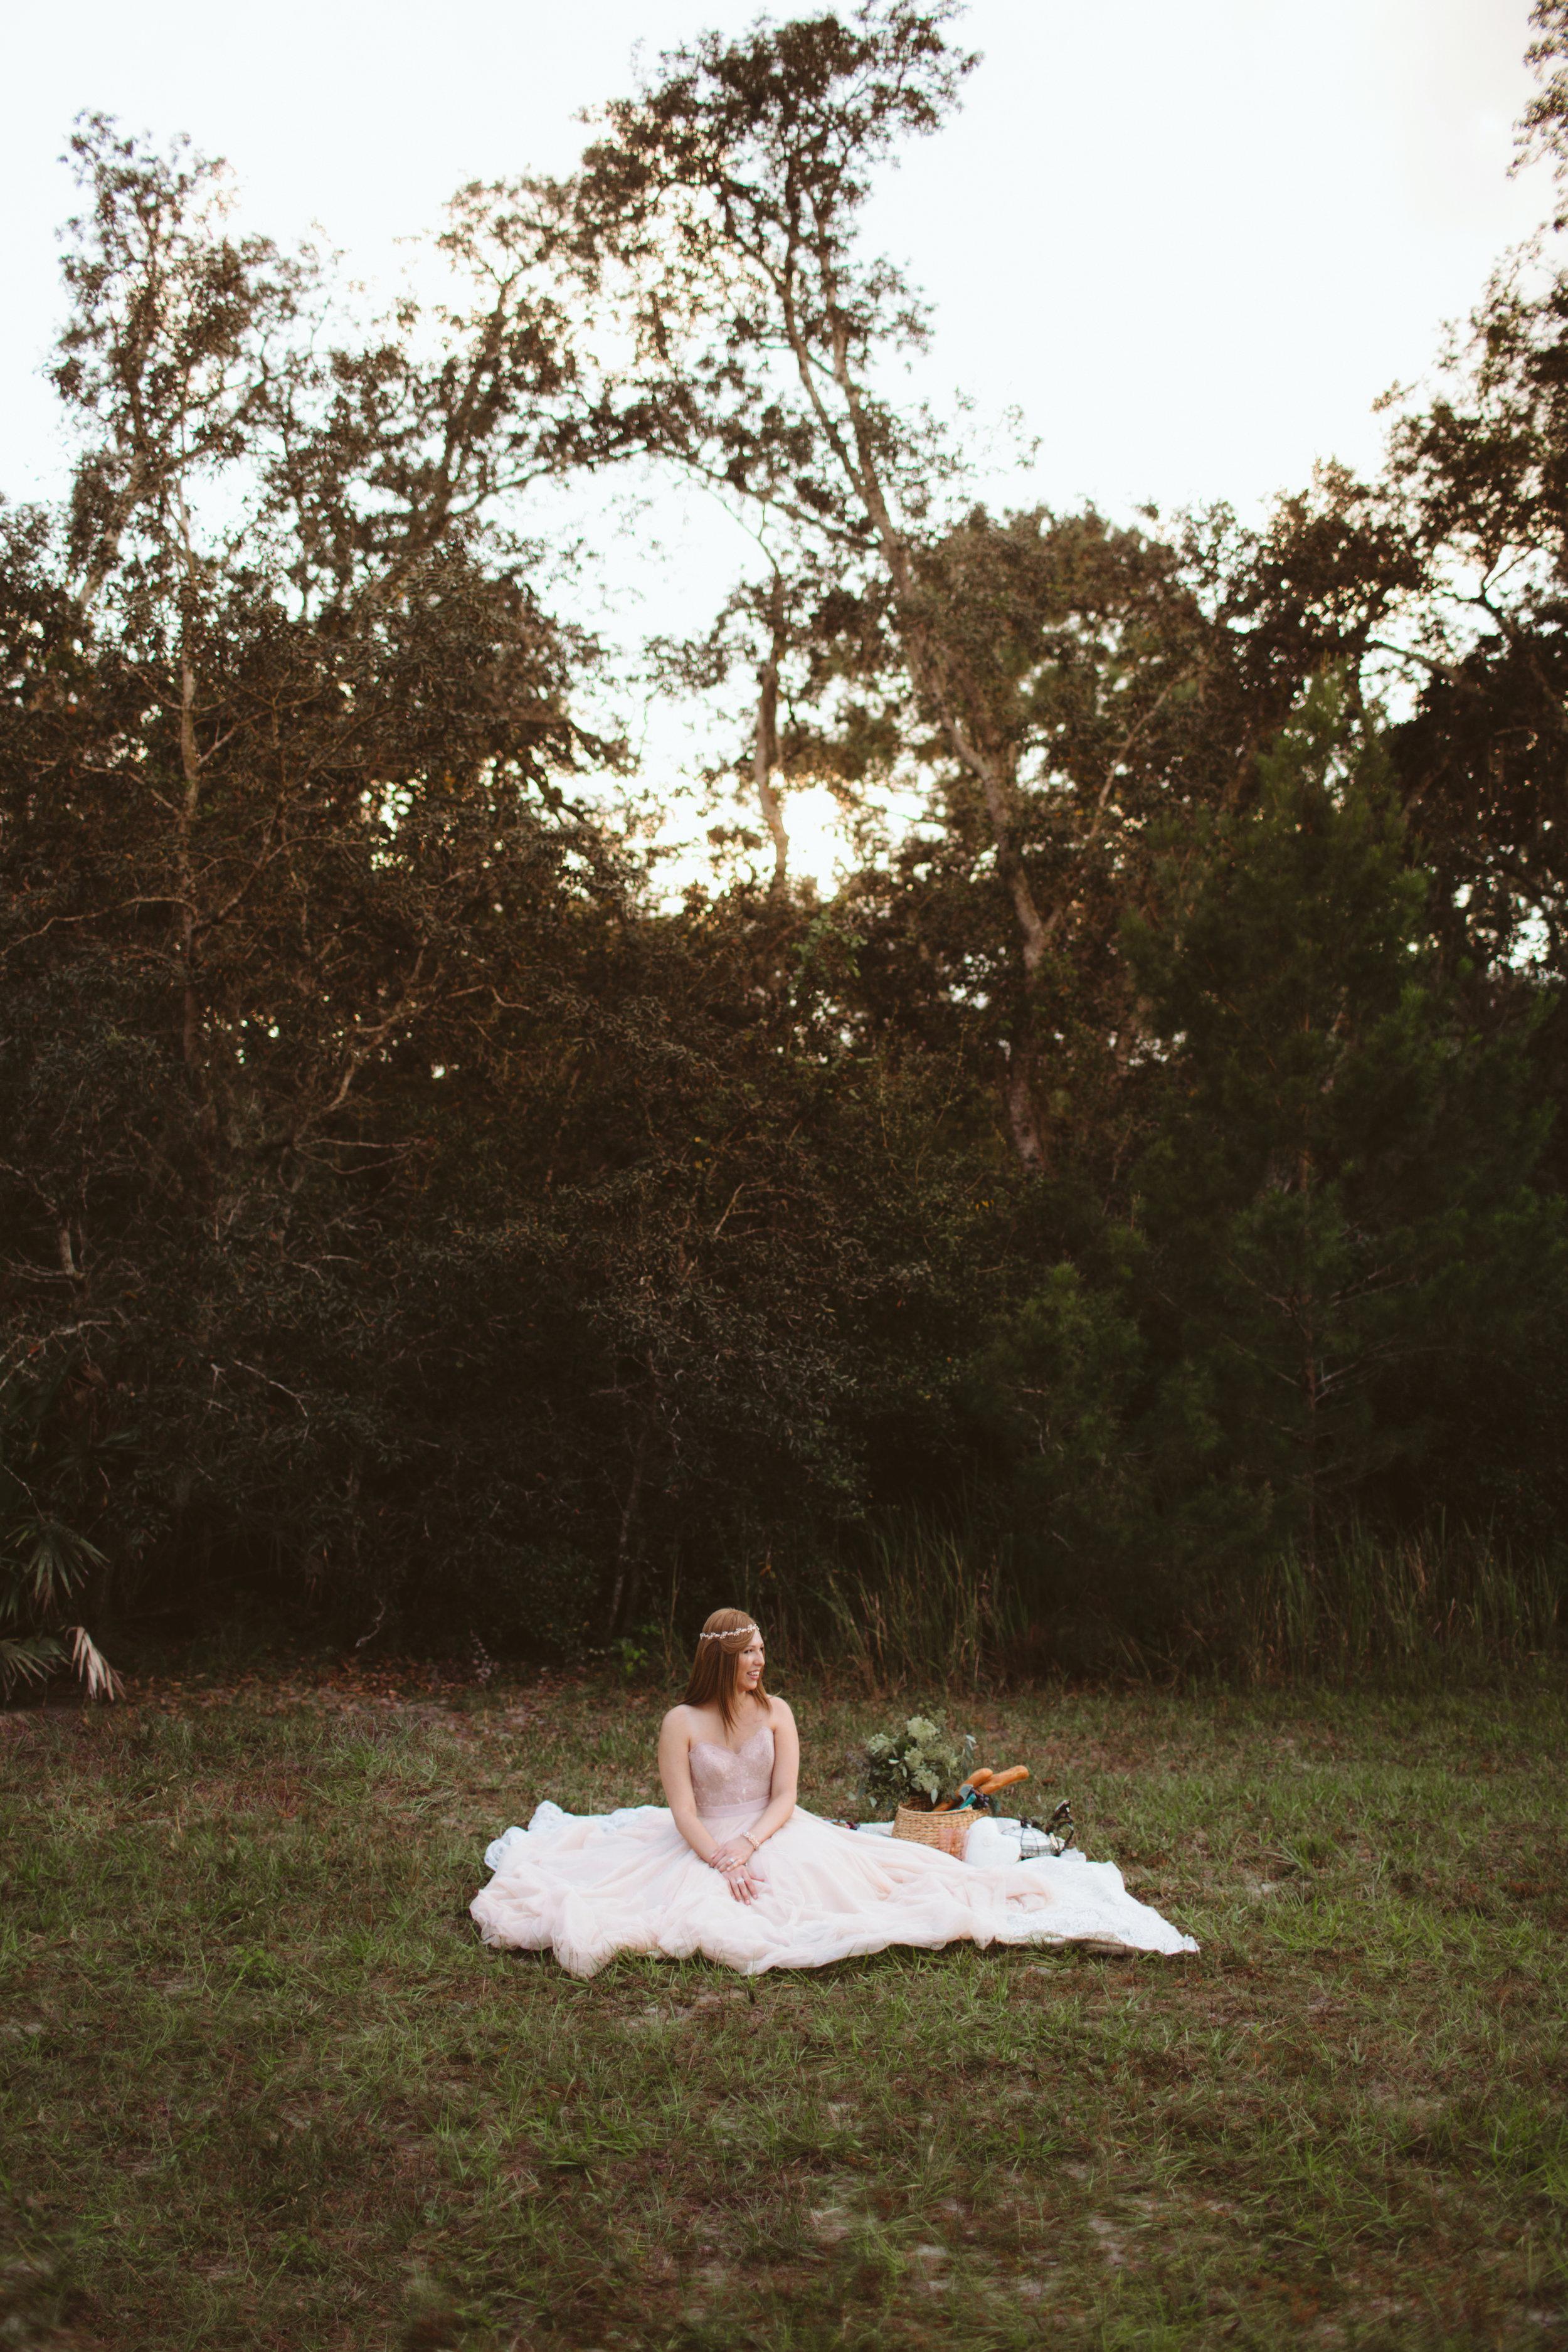 Breast Cancer awareness | Solutions bridal | Waterswoo | Vanessa Boy | vanessaboy.com |-407.com |final.jpg